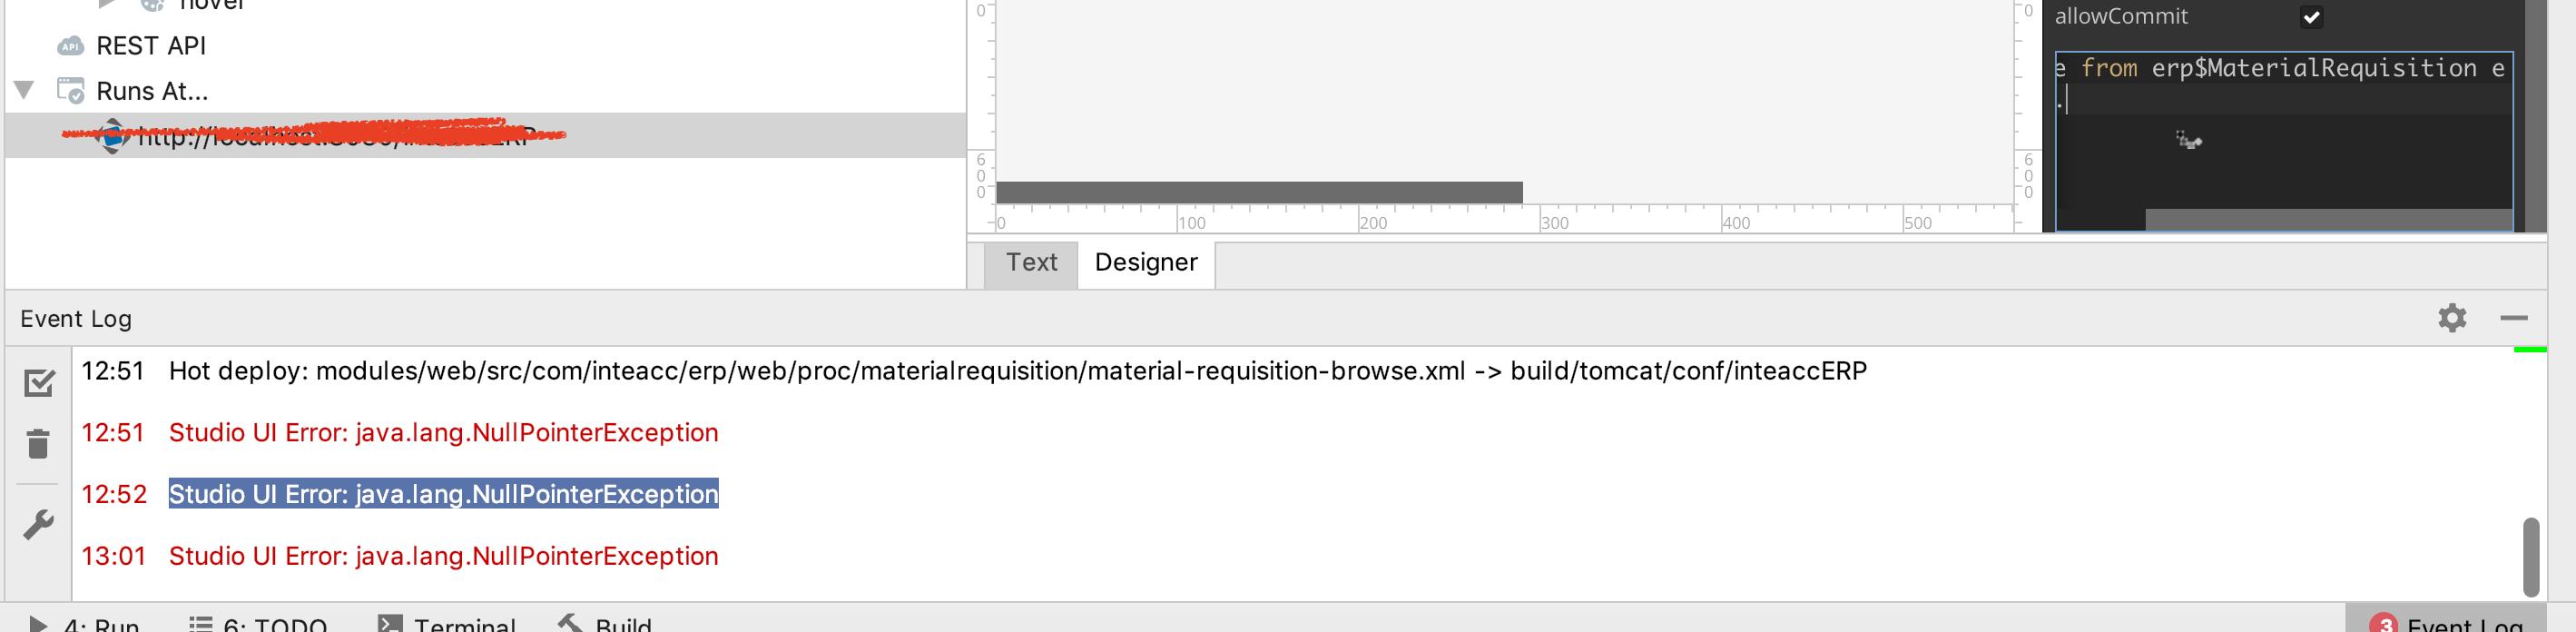 Studio UI error : java lang NullPointerException - Support